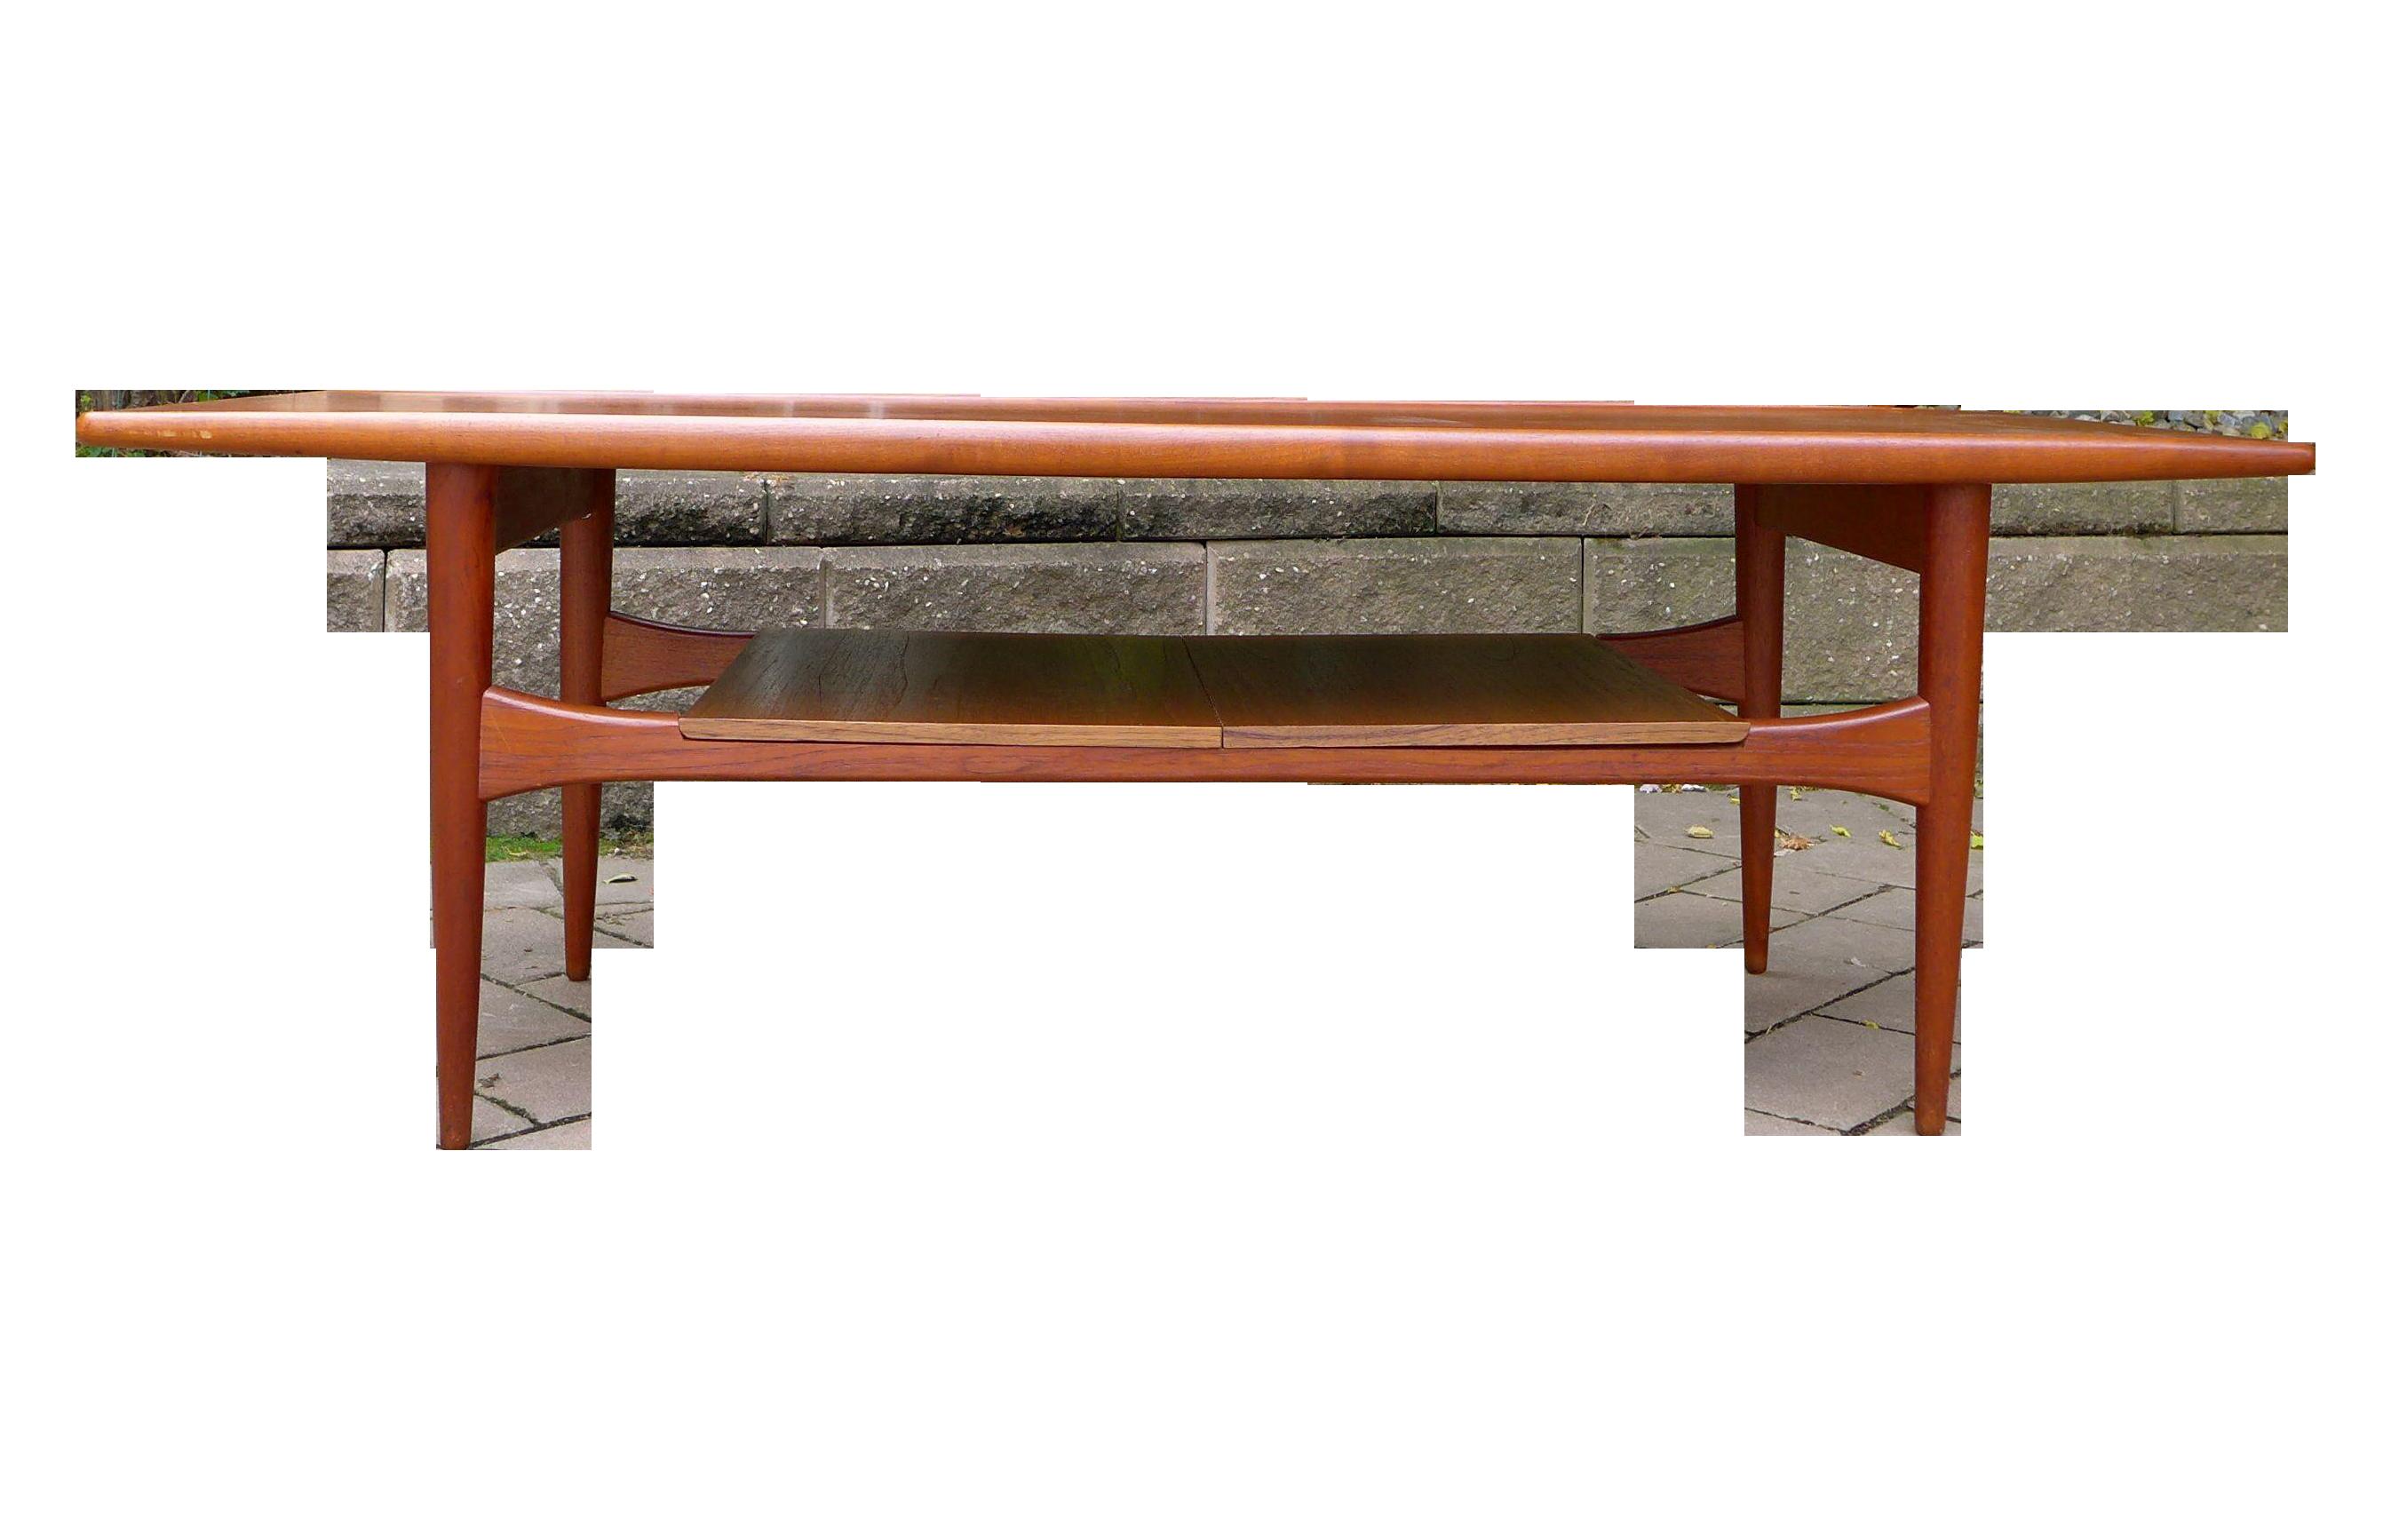 Danish Mid Century Modern Teak Coffee Table Teak Coffee Table Danish Mid Century Modern Coffee Table [ 1734 x 2692 Pixel ]